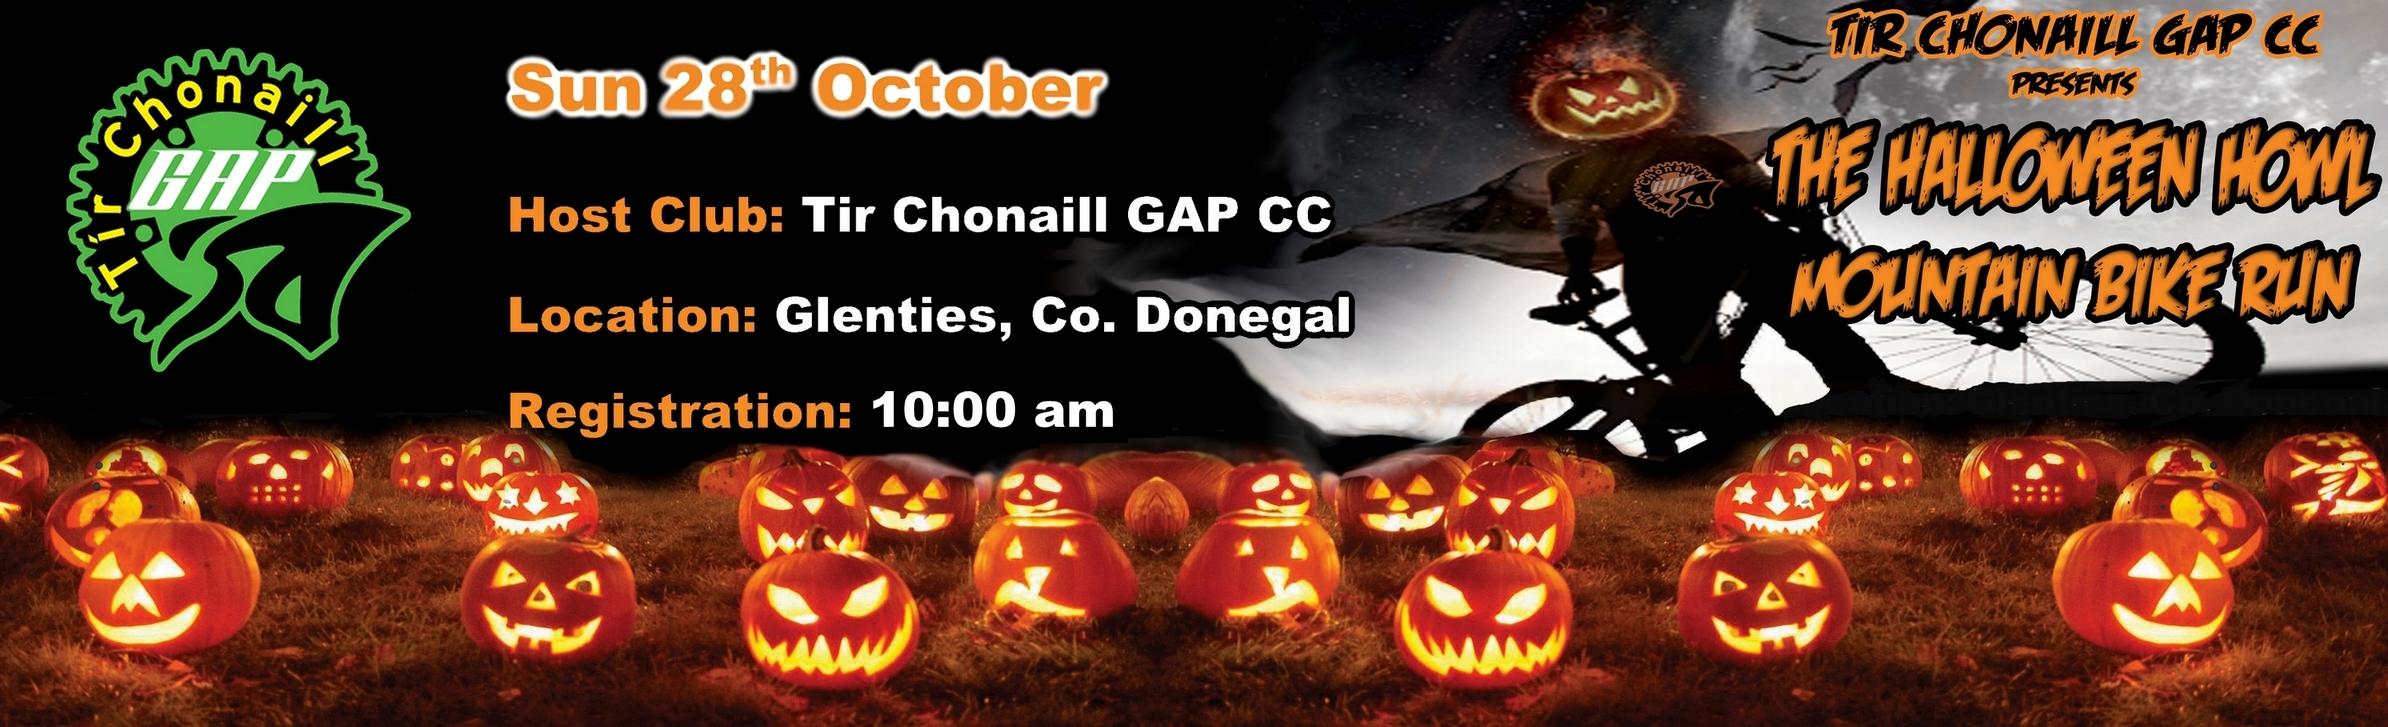 http://www.tirchonaillgapcc.com/wp-content/uploads/2018/09/HalloweenMTBLandscape.jpg